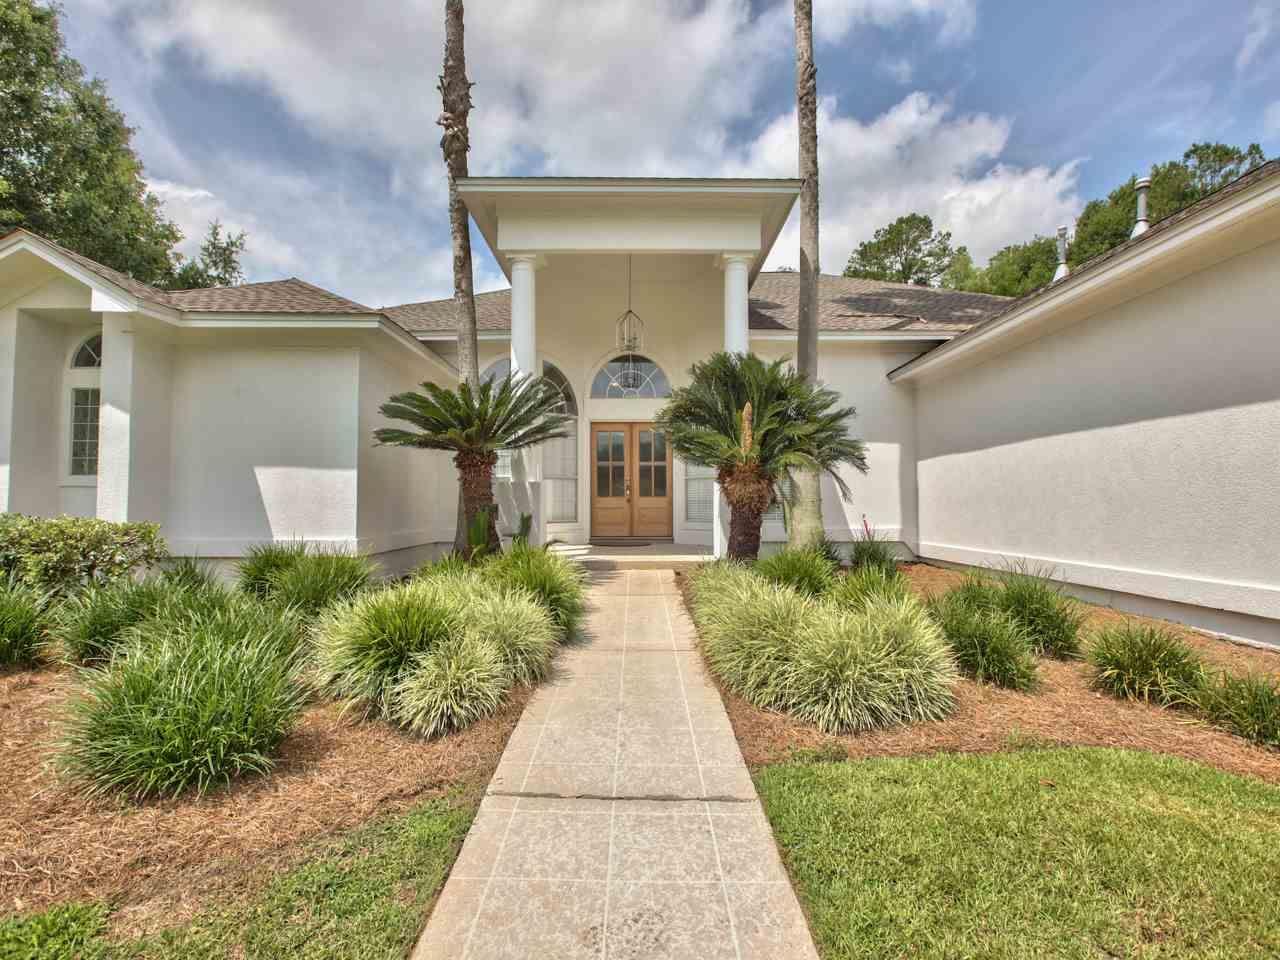 Photo of 6248 Hines Hill Circle, TALLAHASSEE, FL 32312 (MLS # 319571)